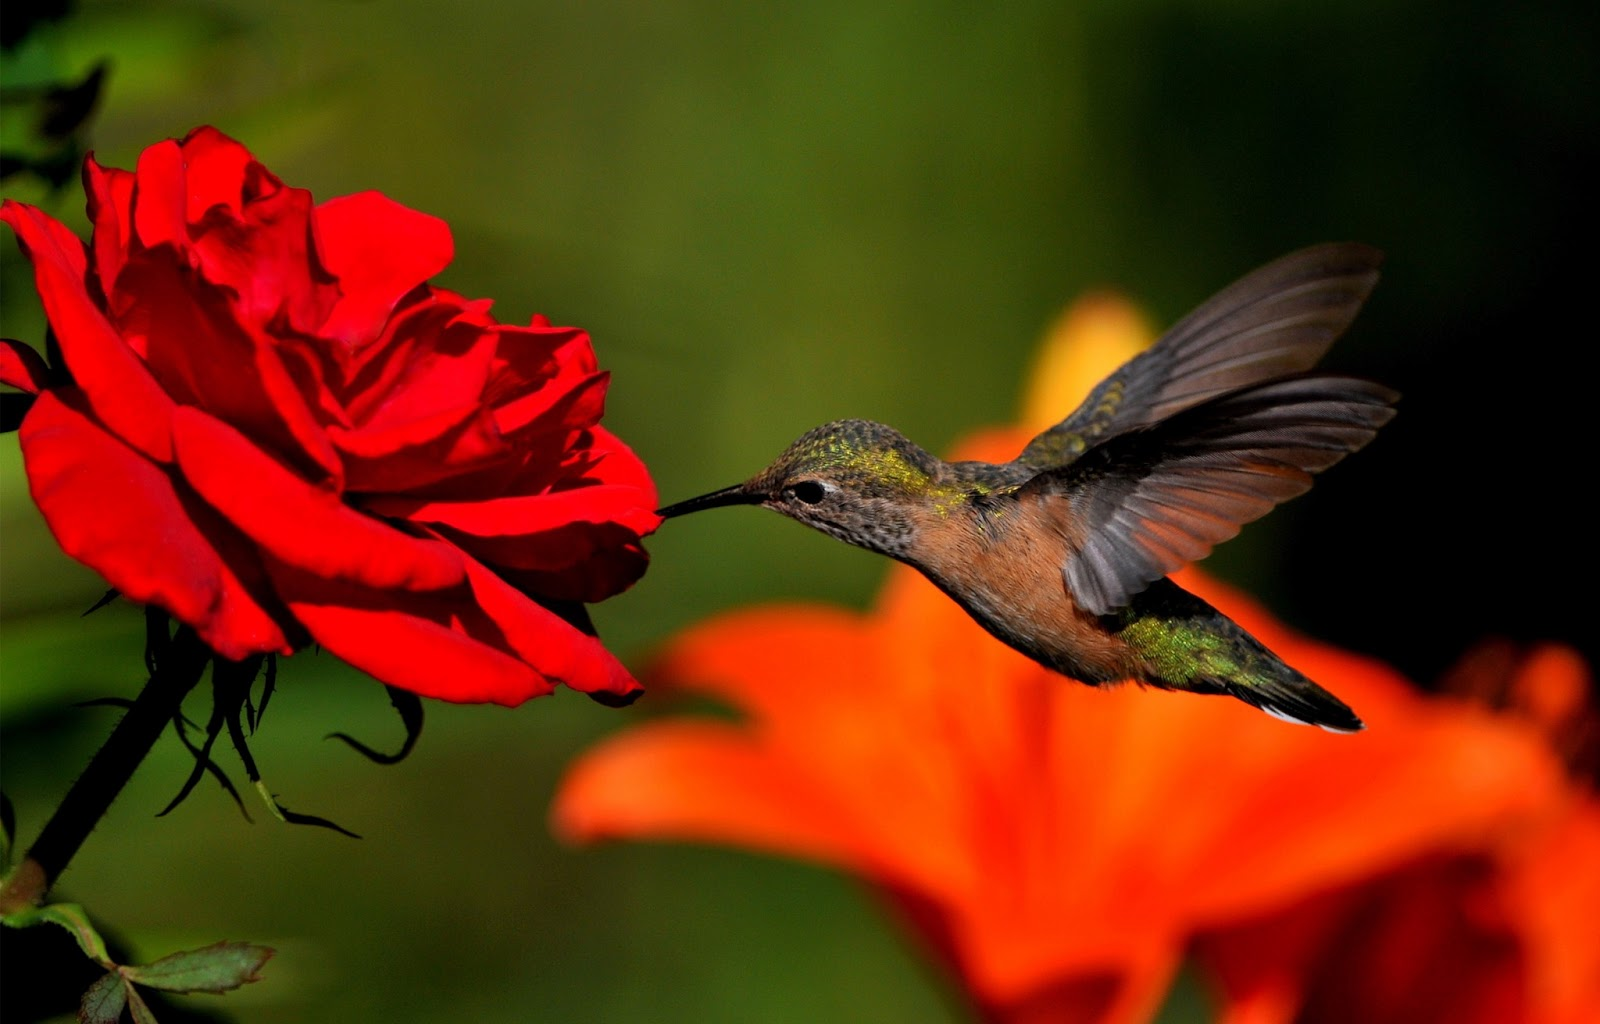 Hummingbird wallpaper background wallpapersafari - Wallpaper 1600x1024 ...